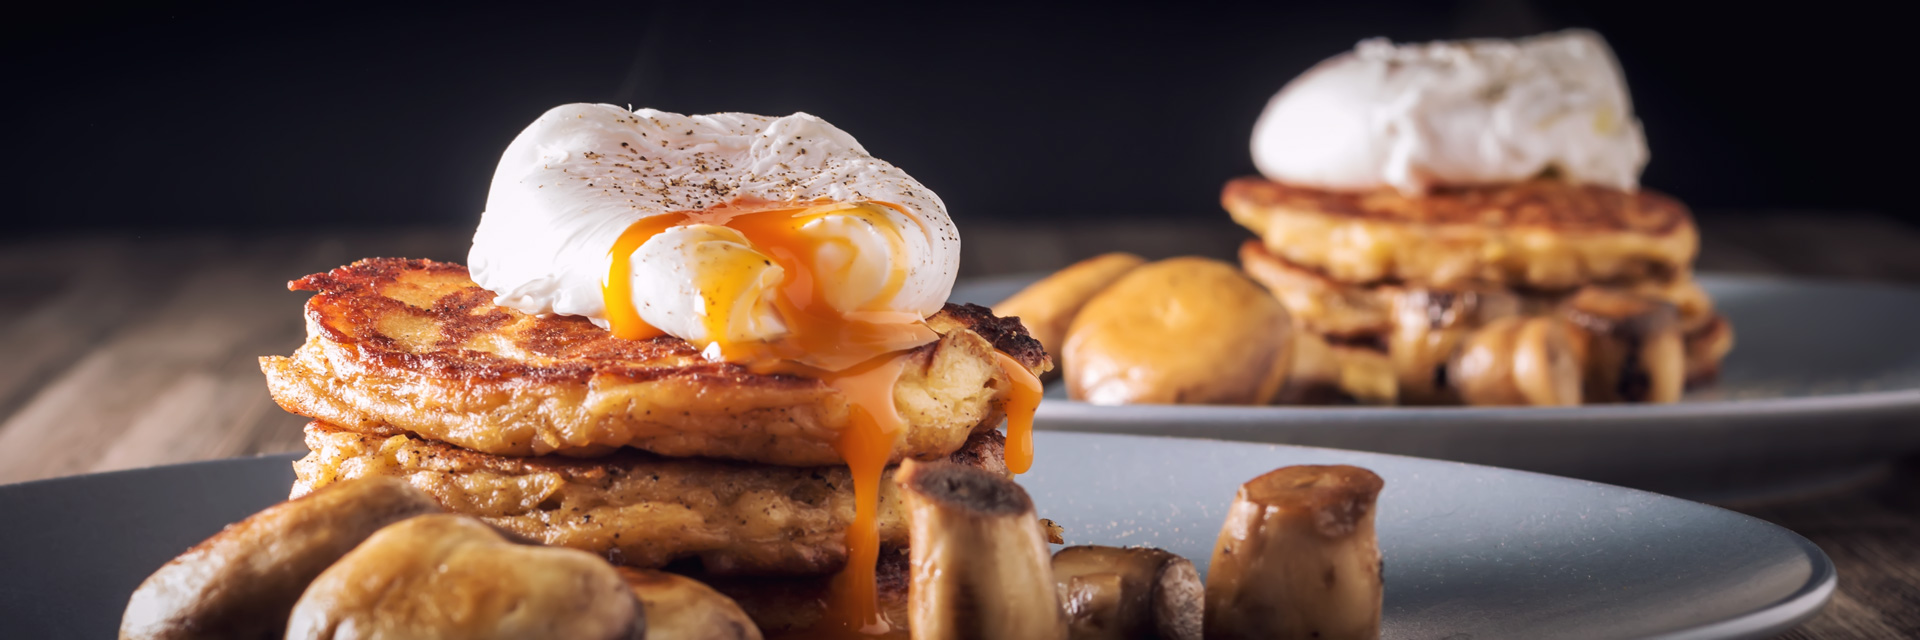 Boxty: Irish Potato Pancake | Krumpli